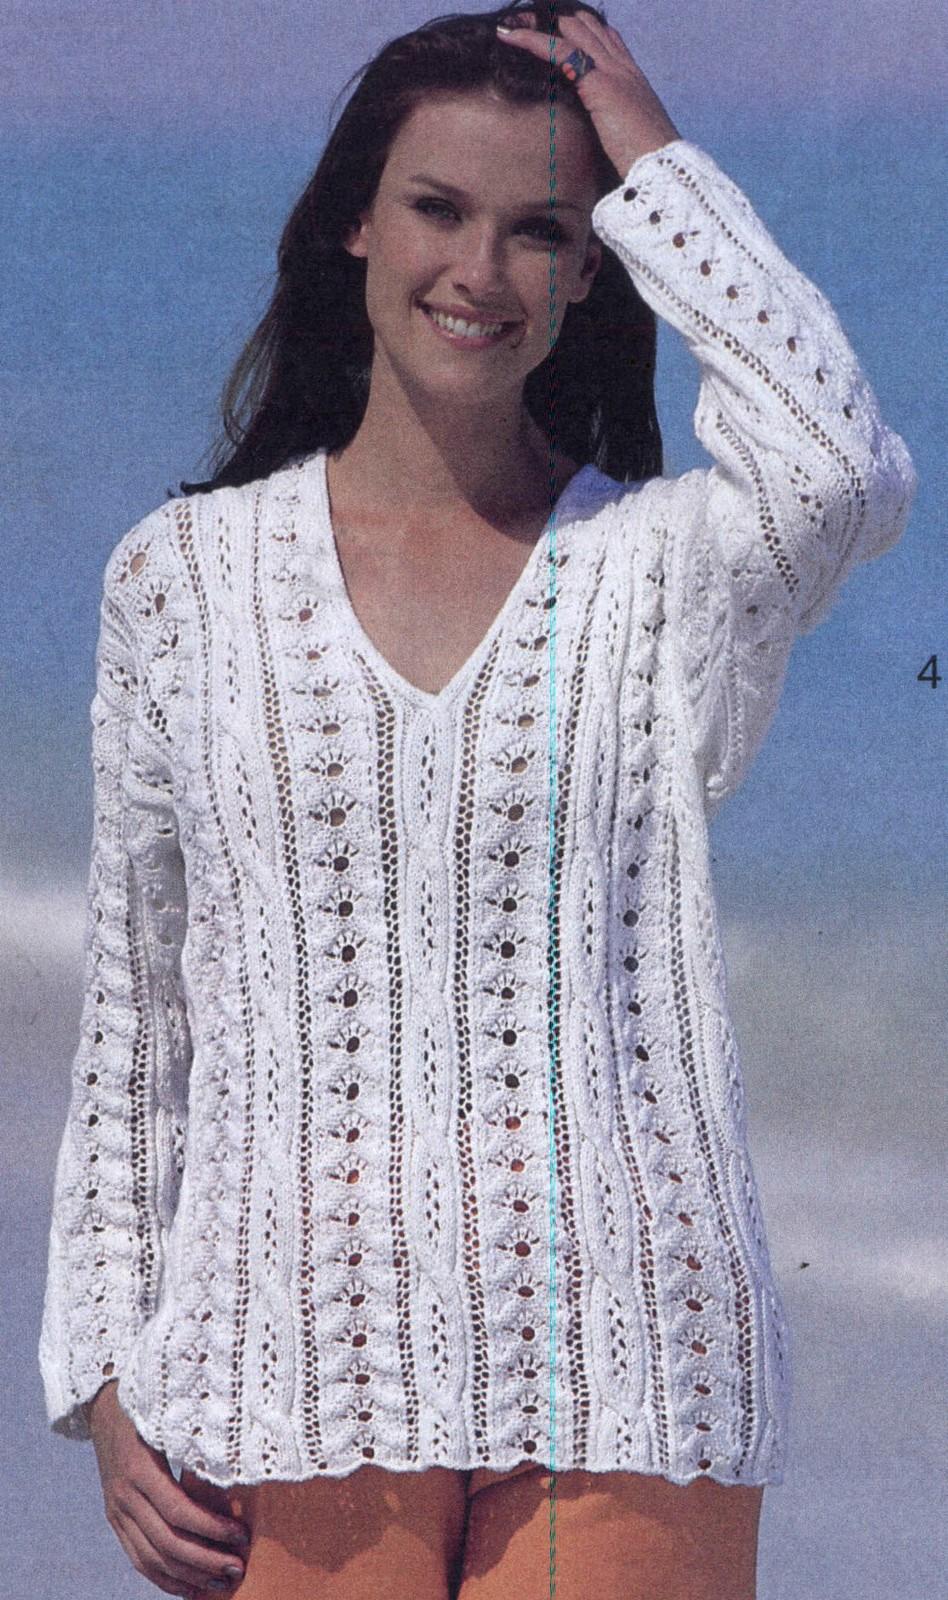 Білий ажурний пуловер